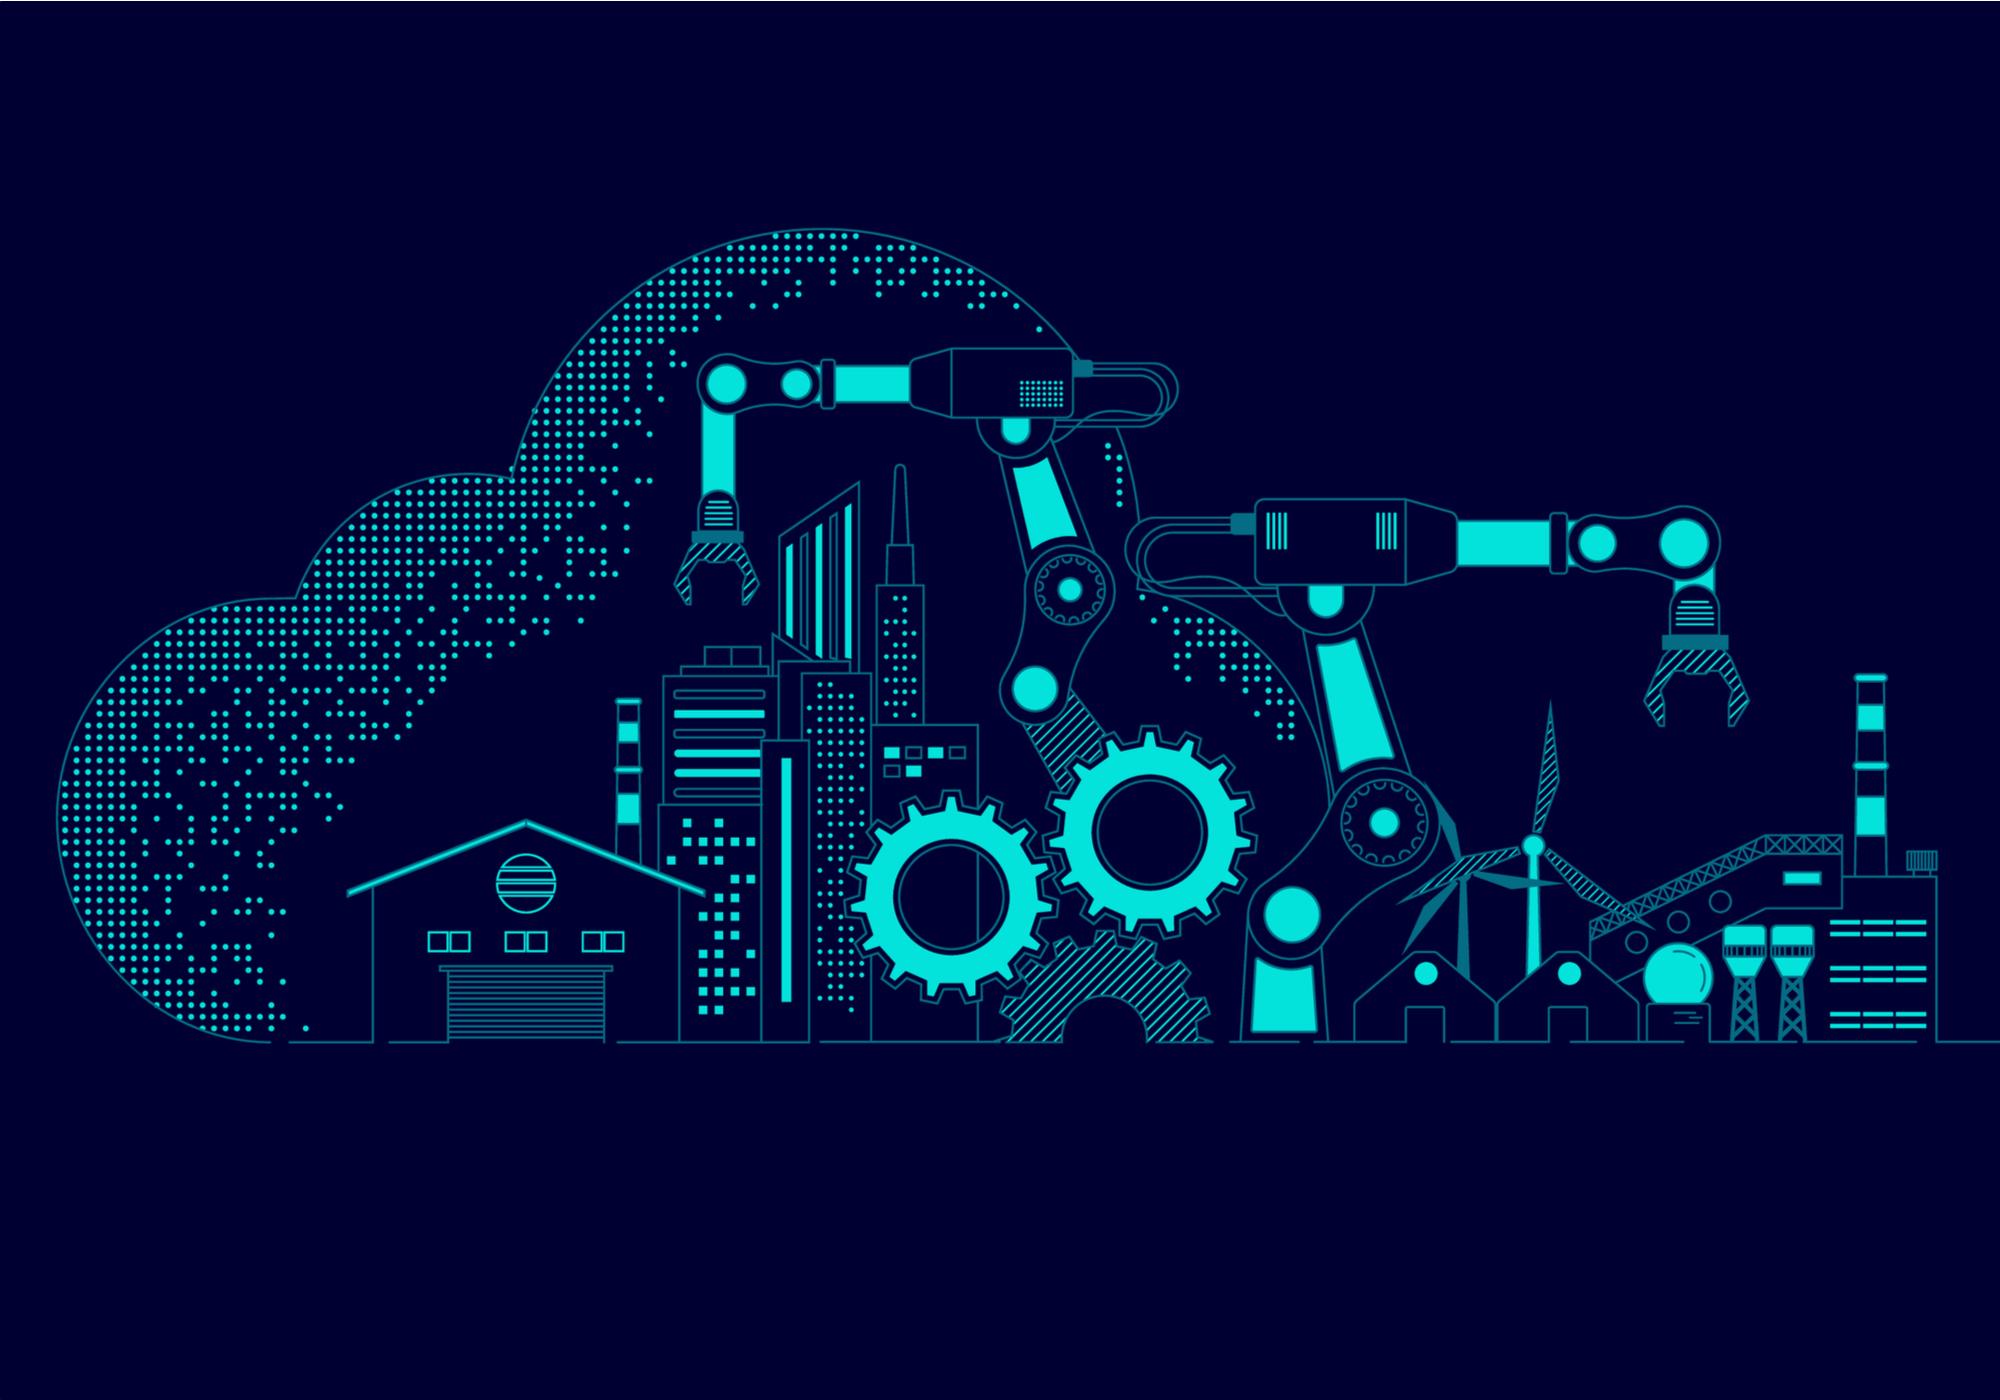 Edge AI startup Adapdix raises $8m for smart manufacturing platform